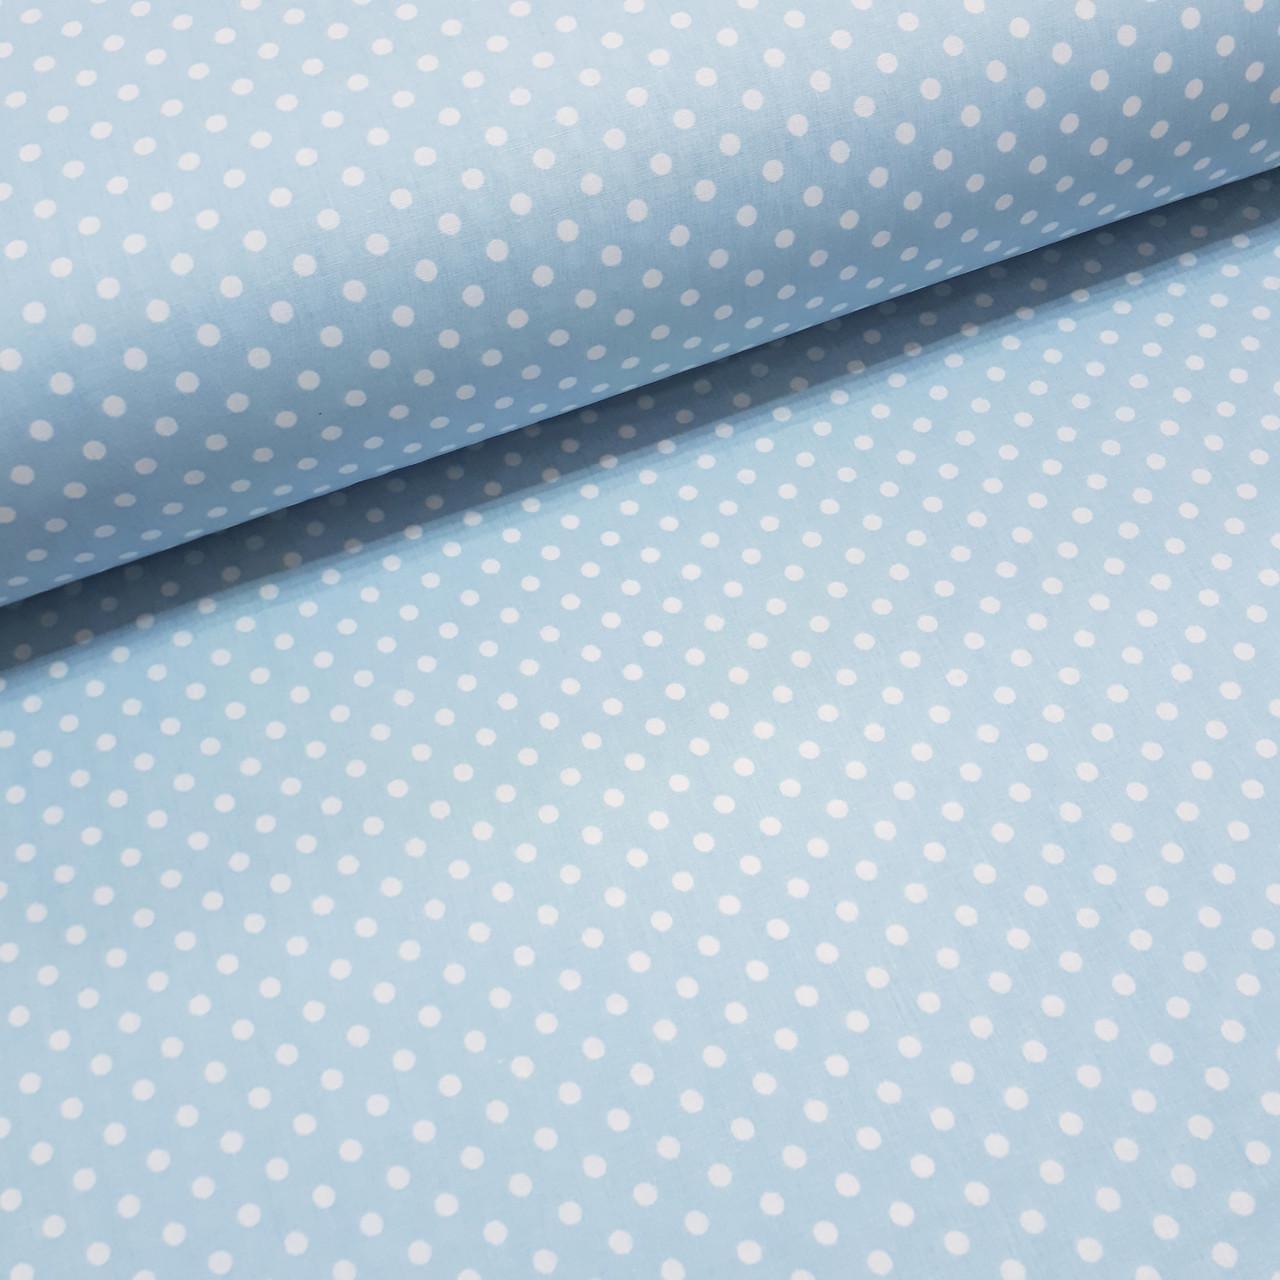 Ткань поплин белый горошек на голубом 6мм(ТУРЦИЯ шир. 2,4 м) №32-65